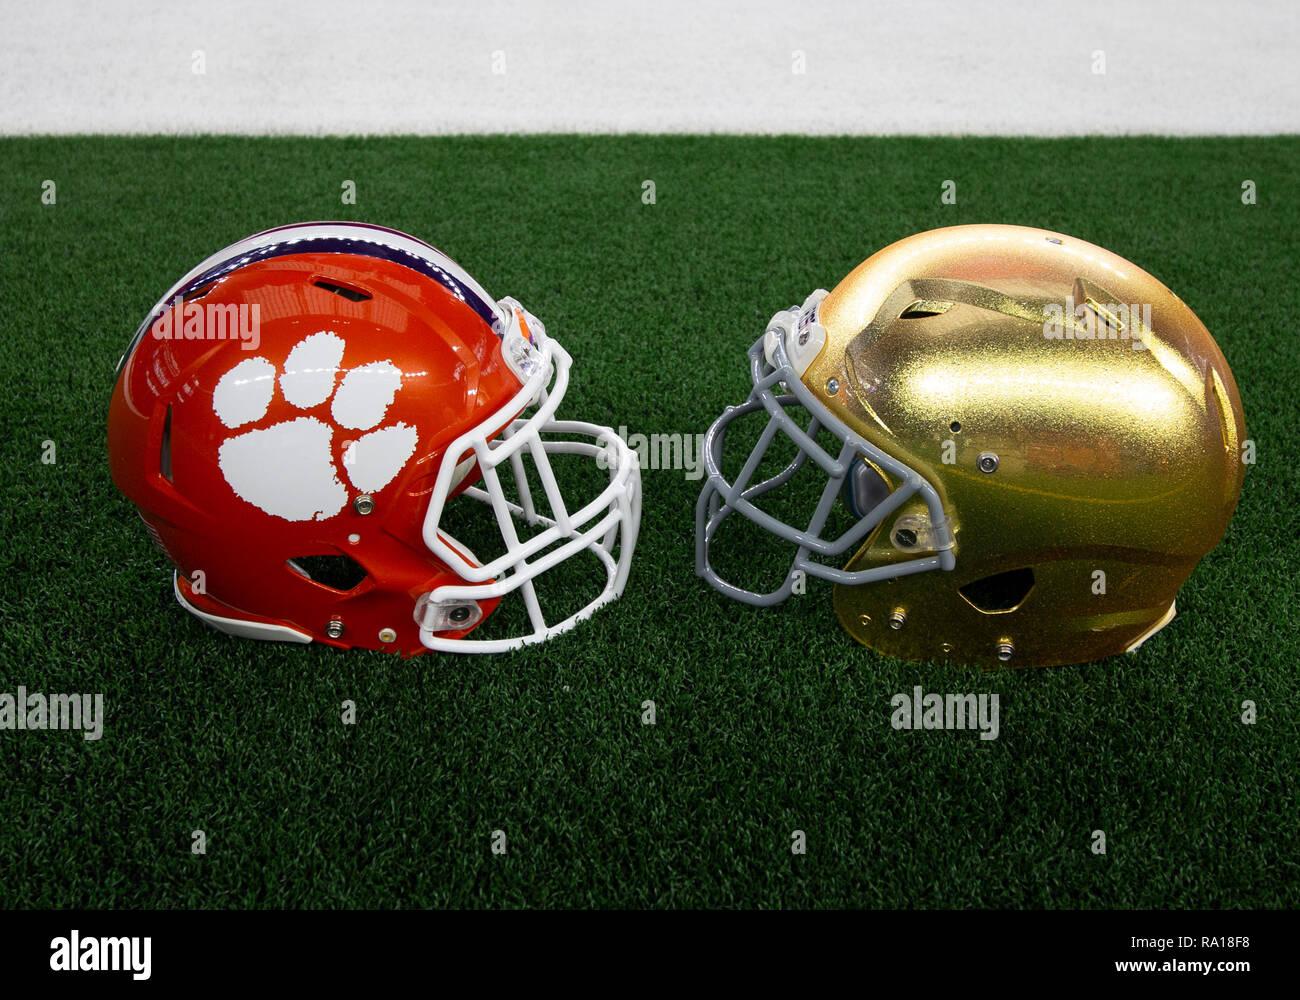 c7613e0d49f8 Sports Souvenirs Notre Dame Fighting Irish 2011 NCAA MINI Helmet Gridiron  Football Helmets